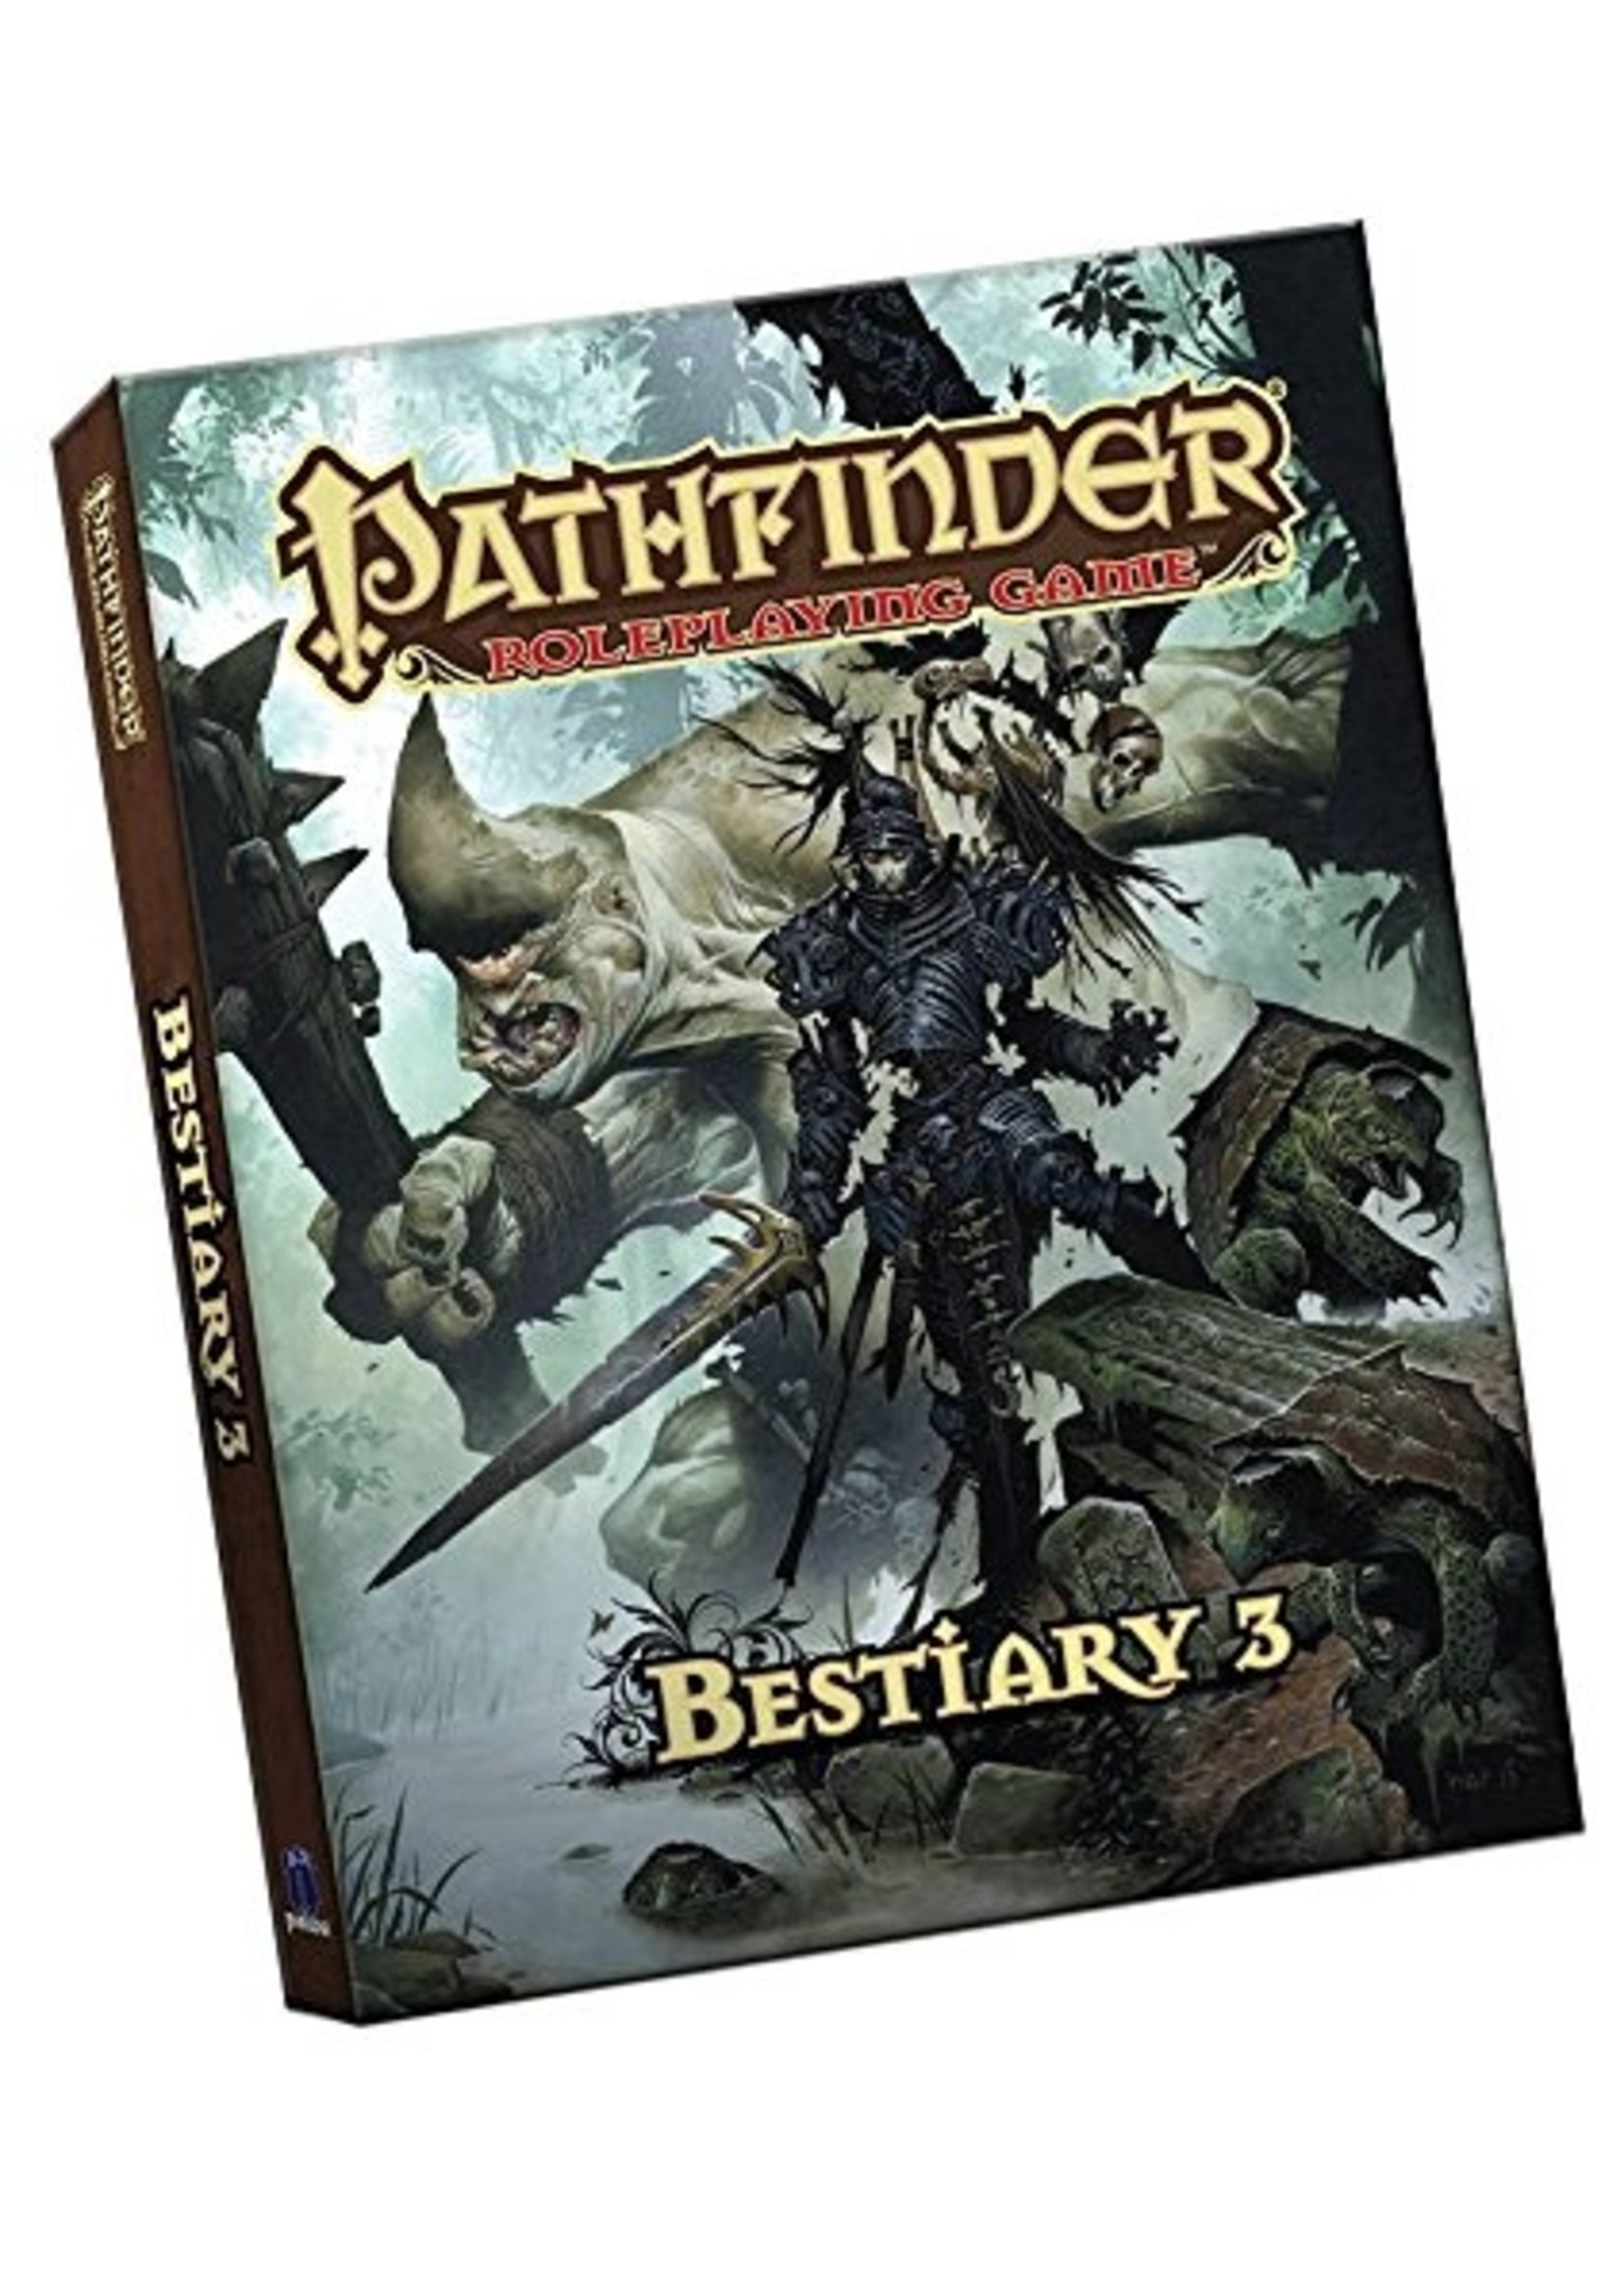 Pathfinder RPG: Bestiary 3 (Pocket Edition) (P2)